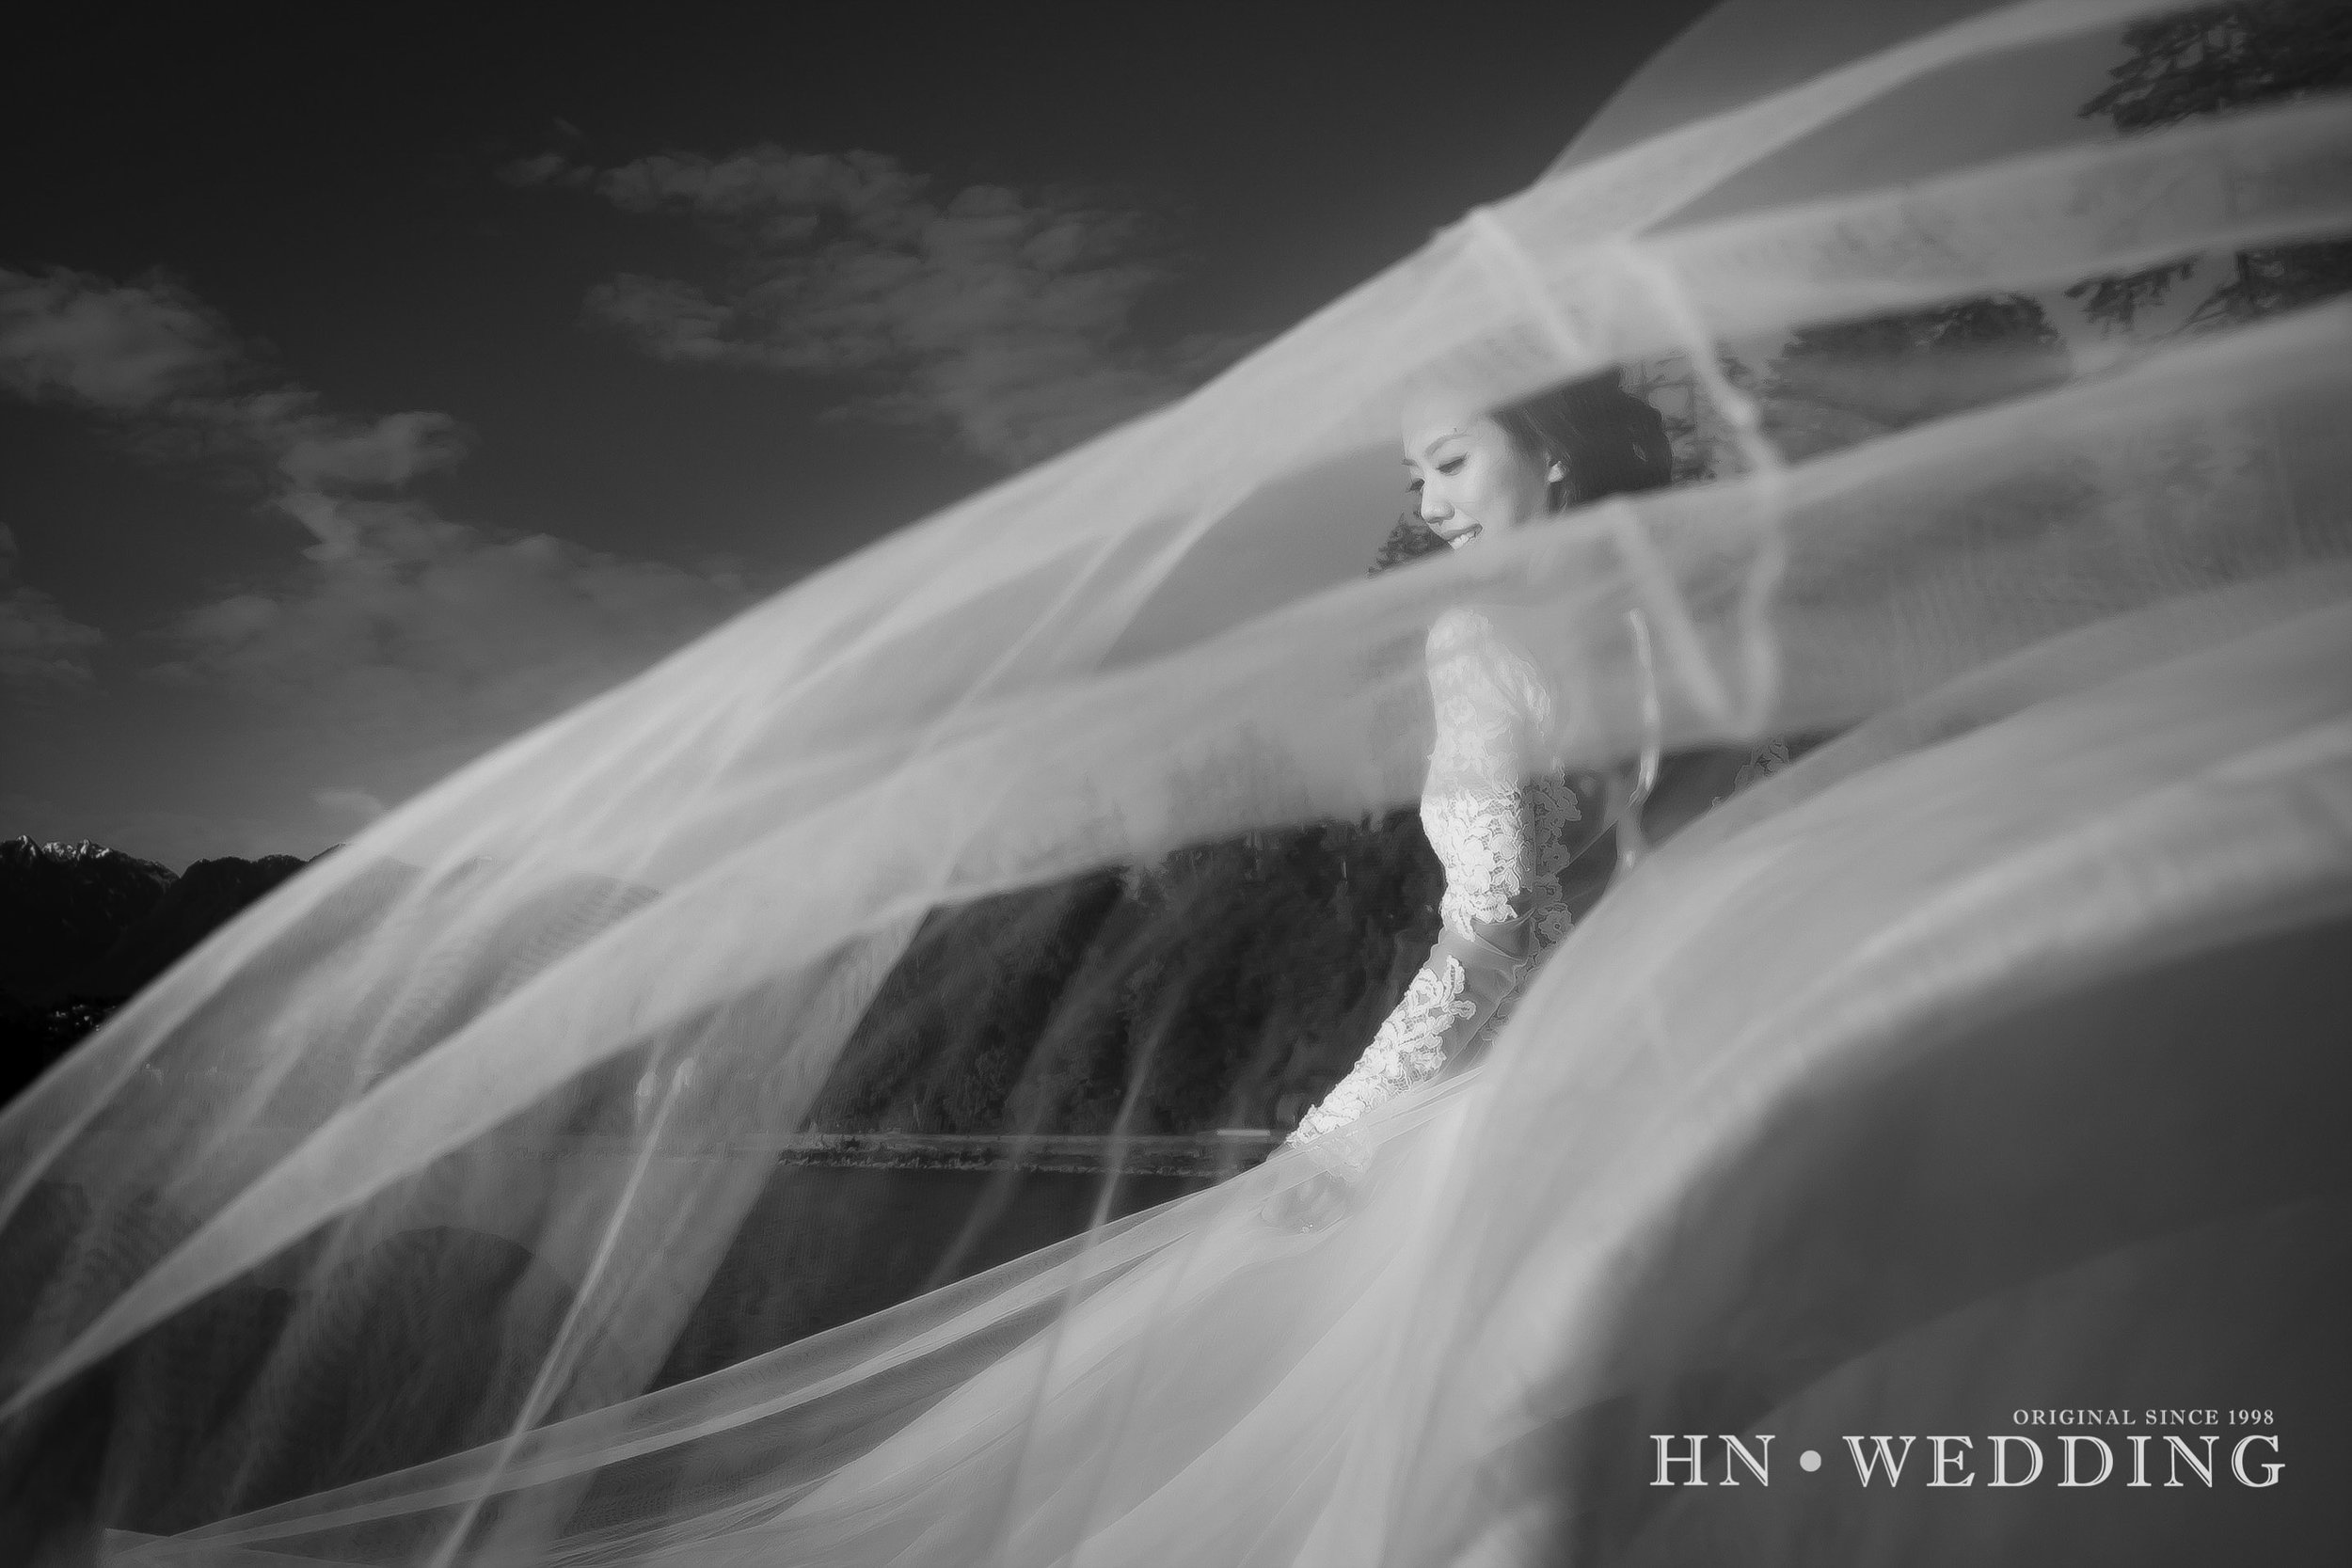 HNwedding-20170602-prewedding--4.jpg